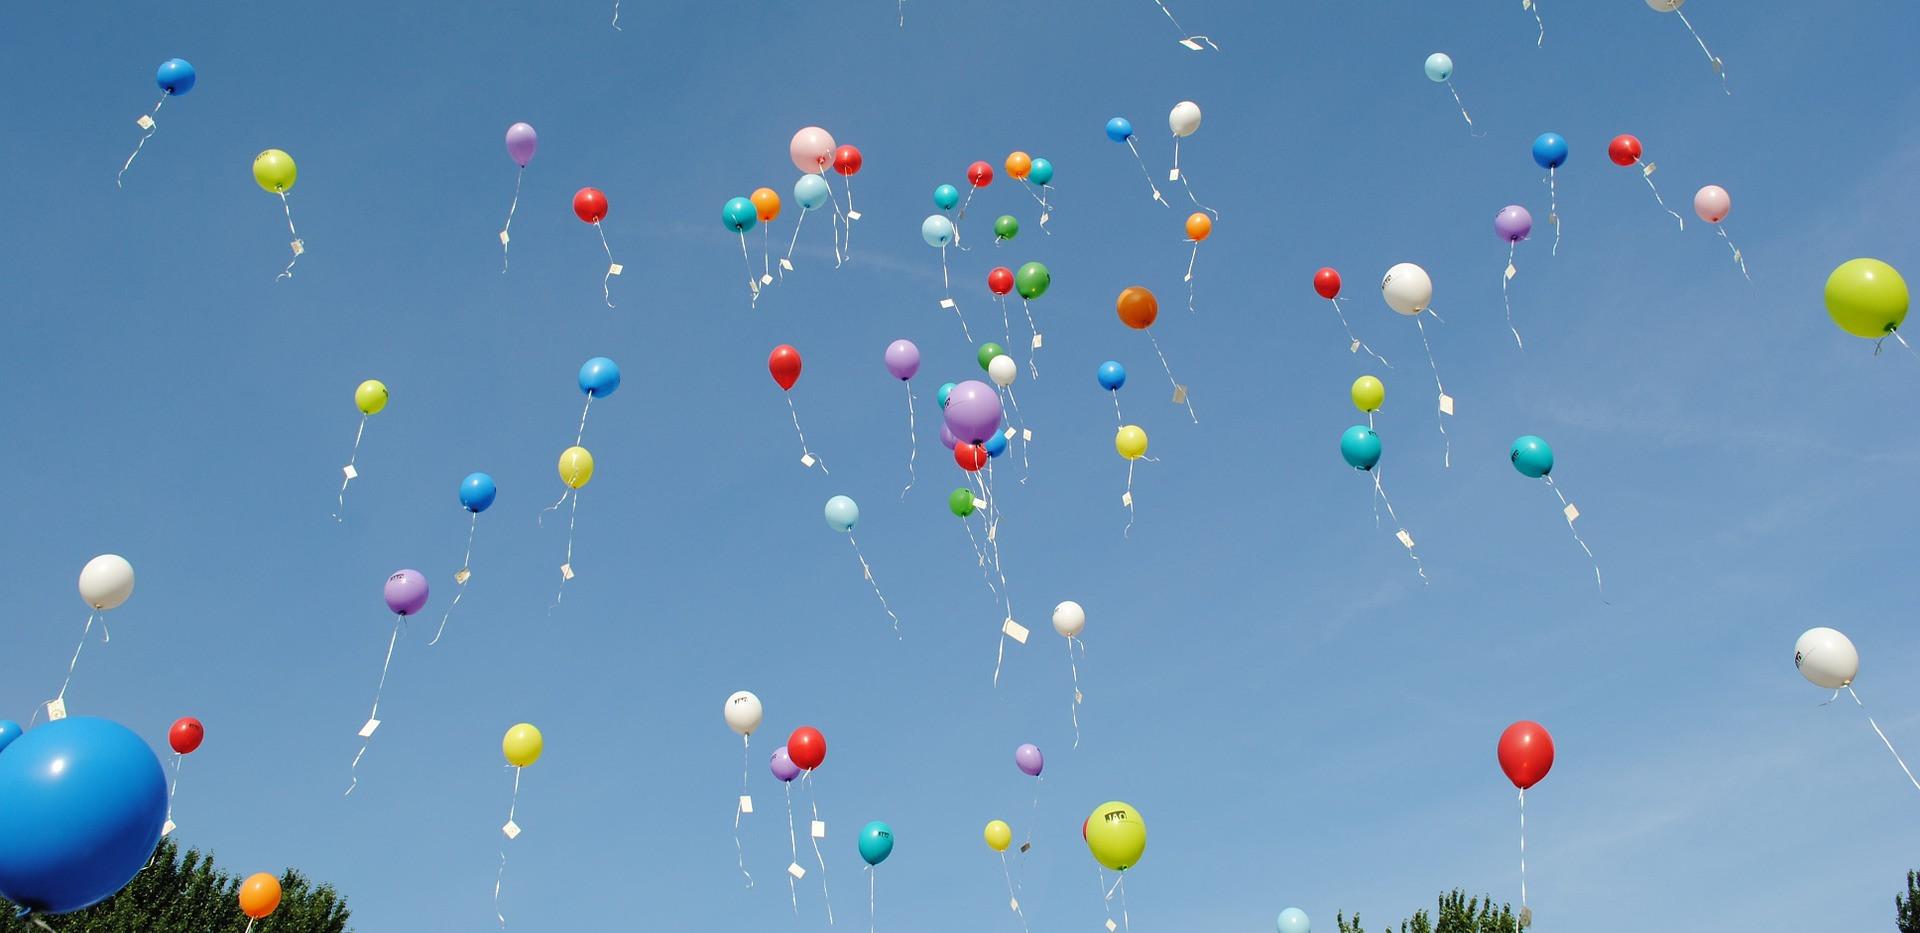 balloons-1012541_1920.jpg